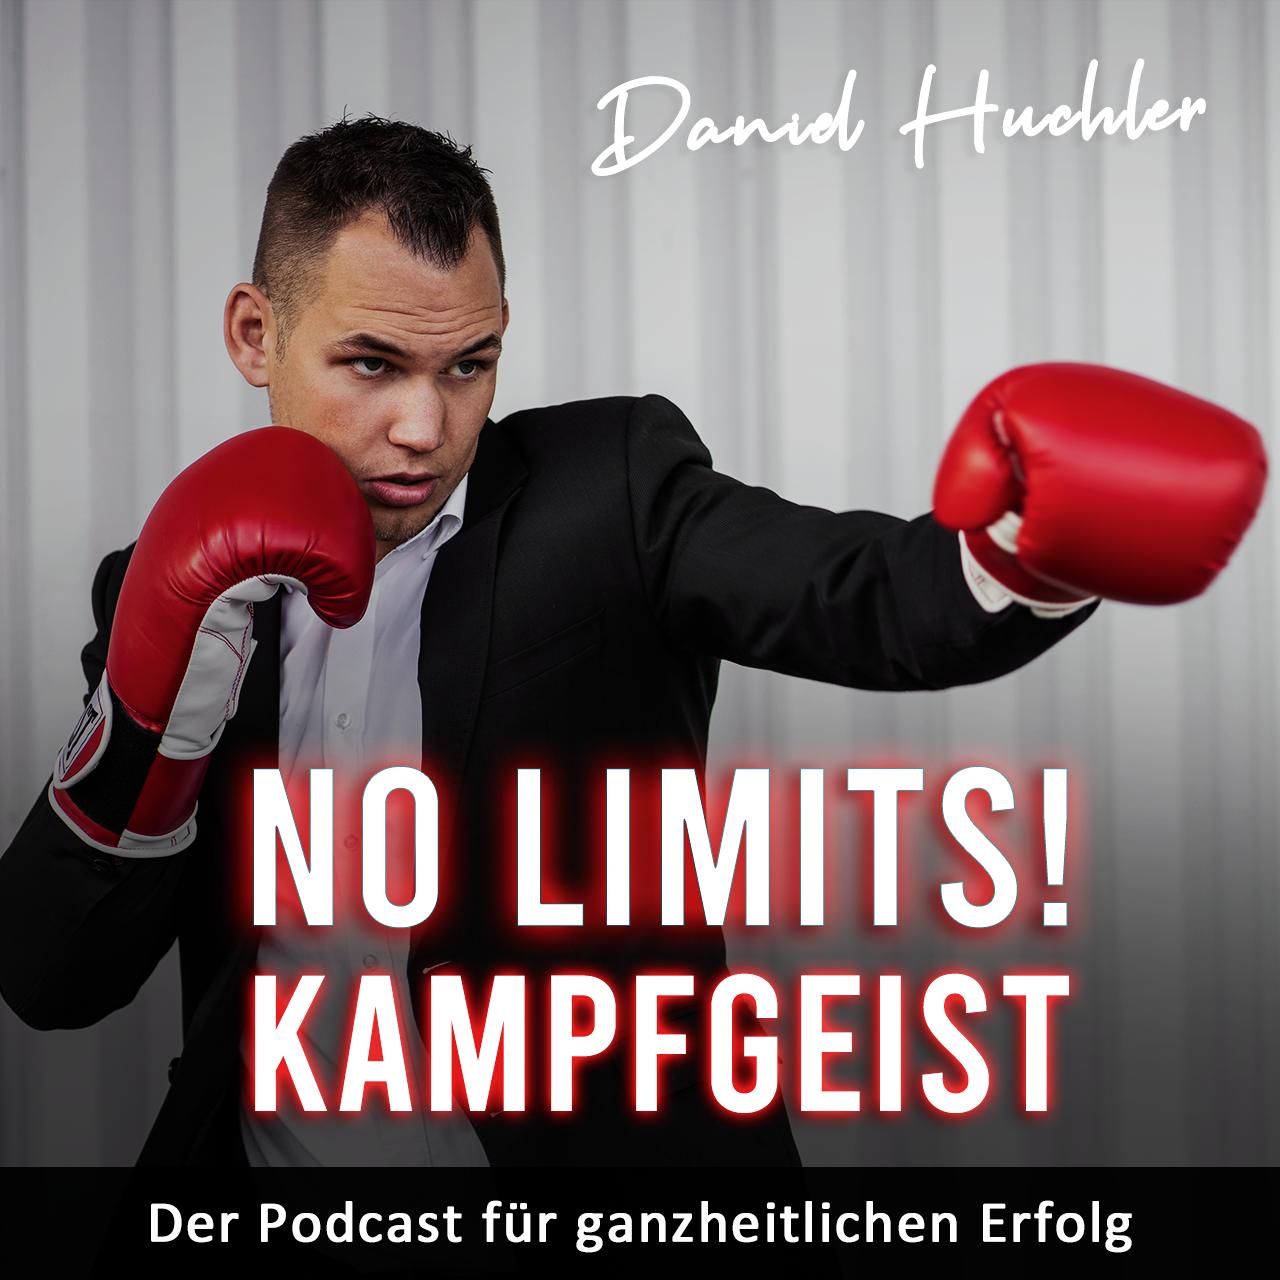 No Limits! Kampfgeist - mit Daniel Huchler show art